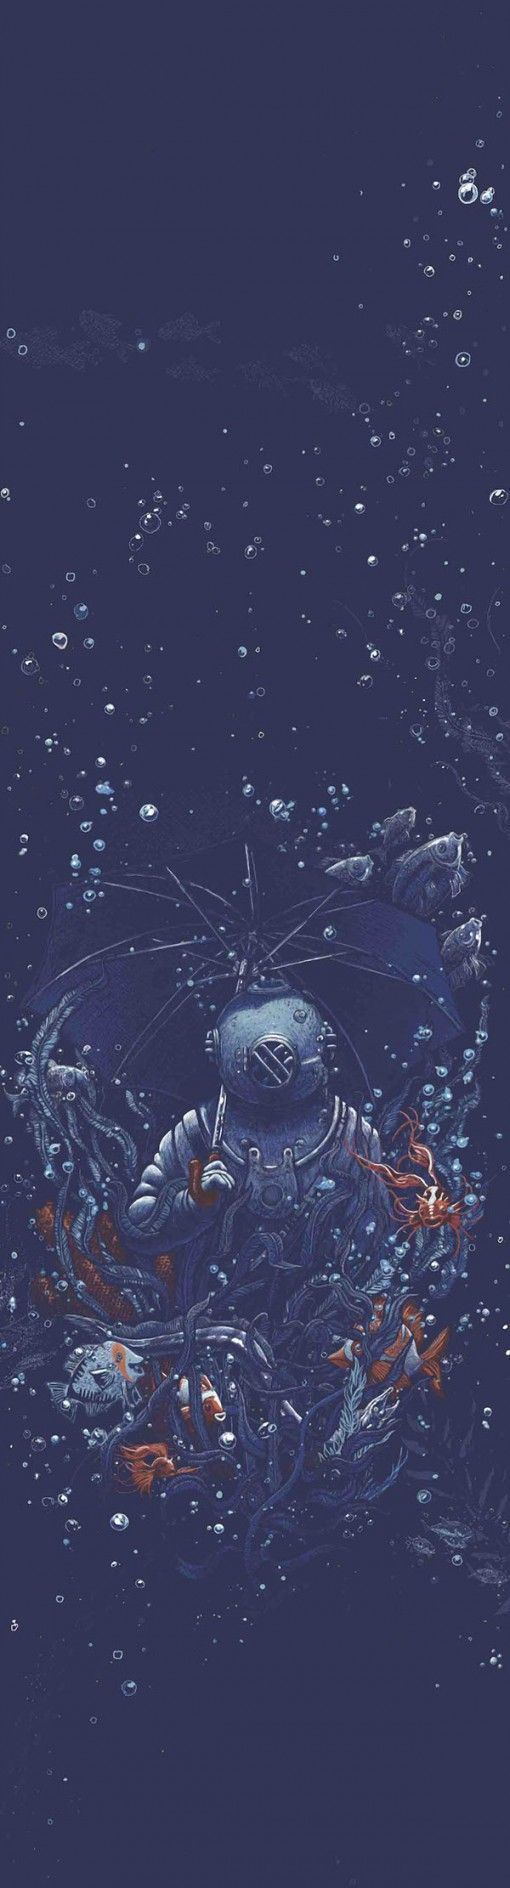 under-the-sea-georges-le-mercenaire-numerik2.jpg